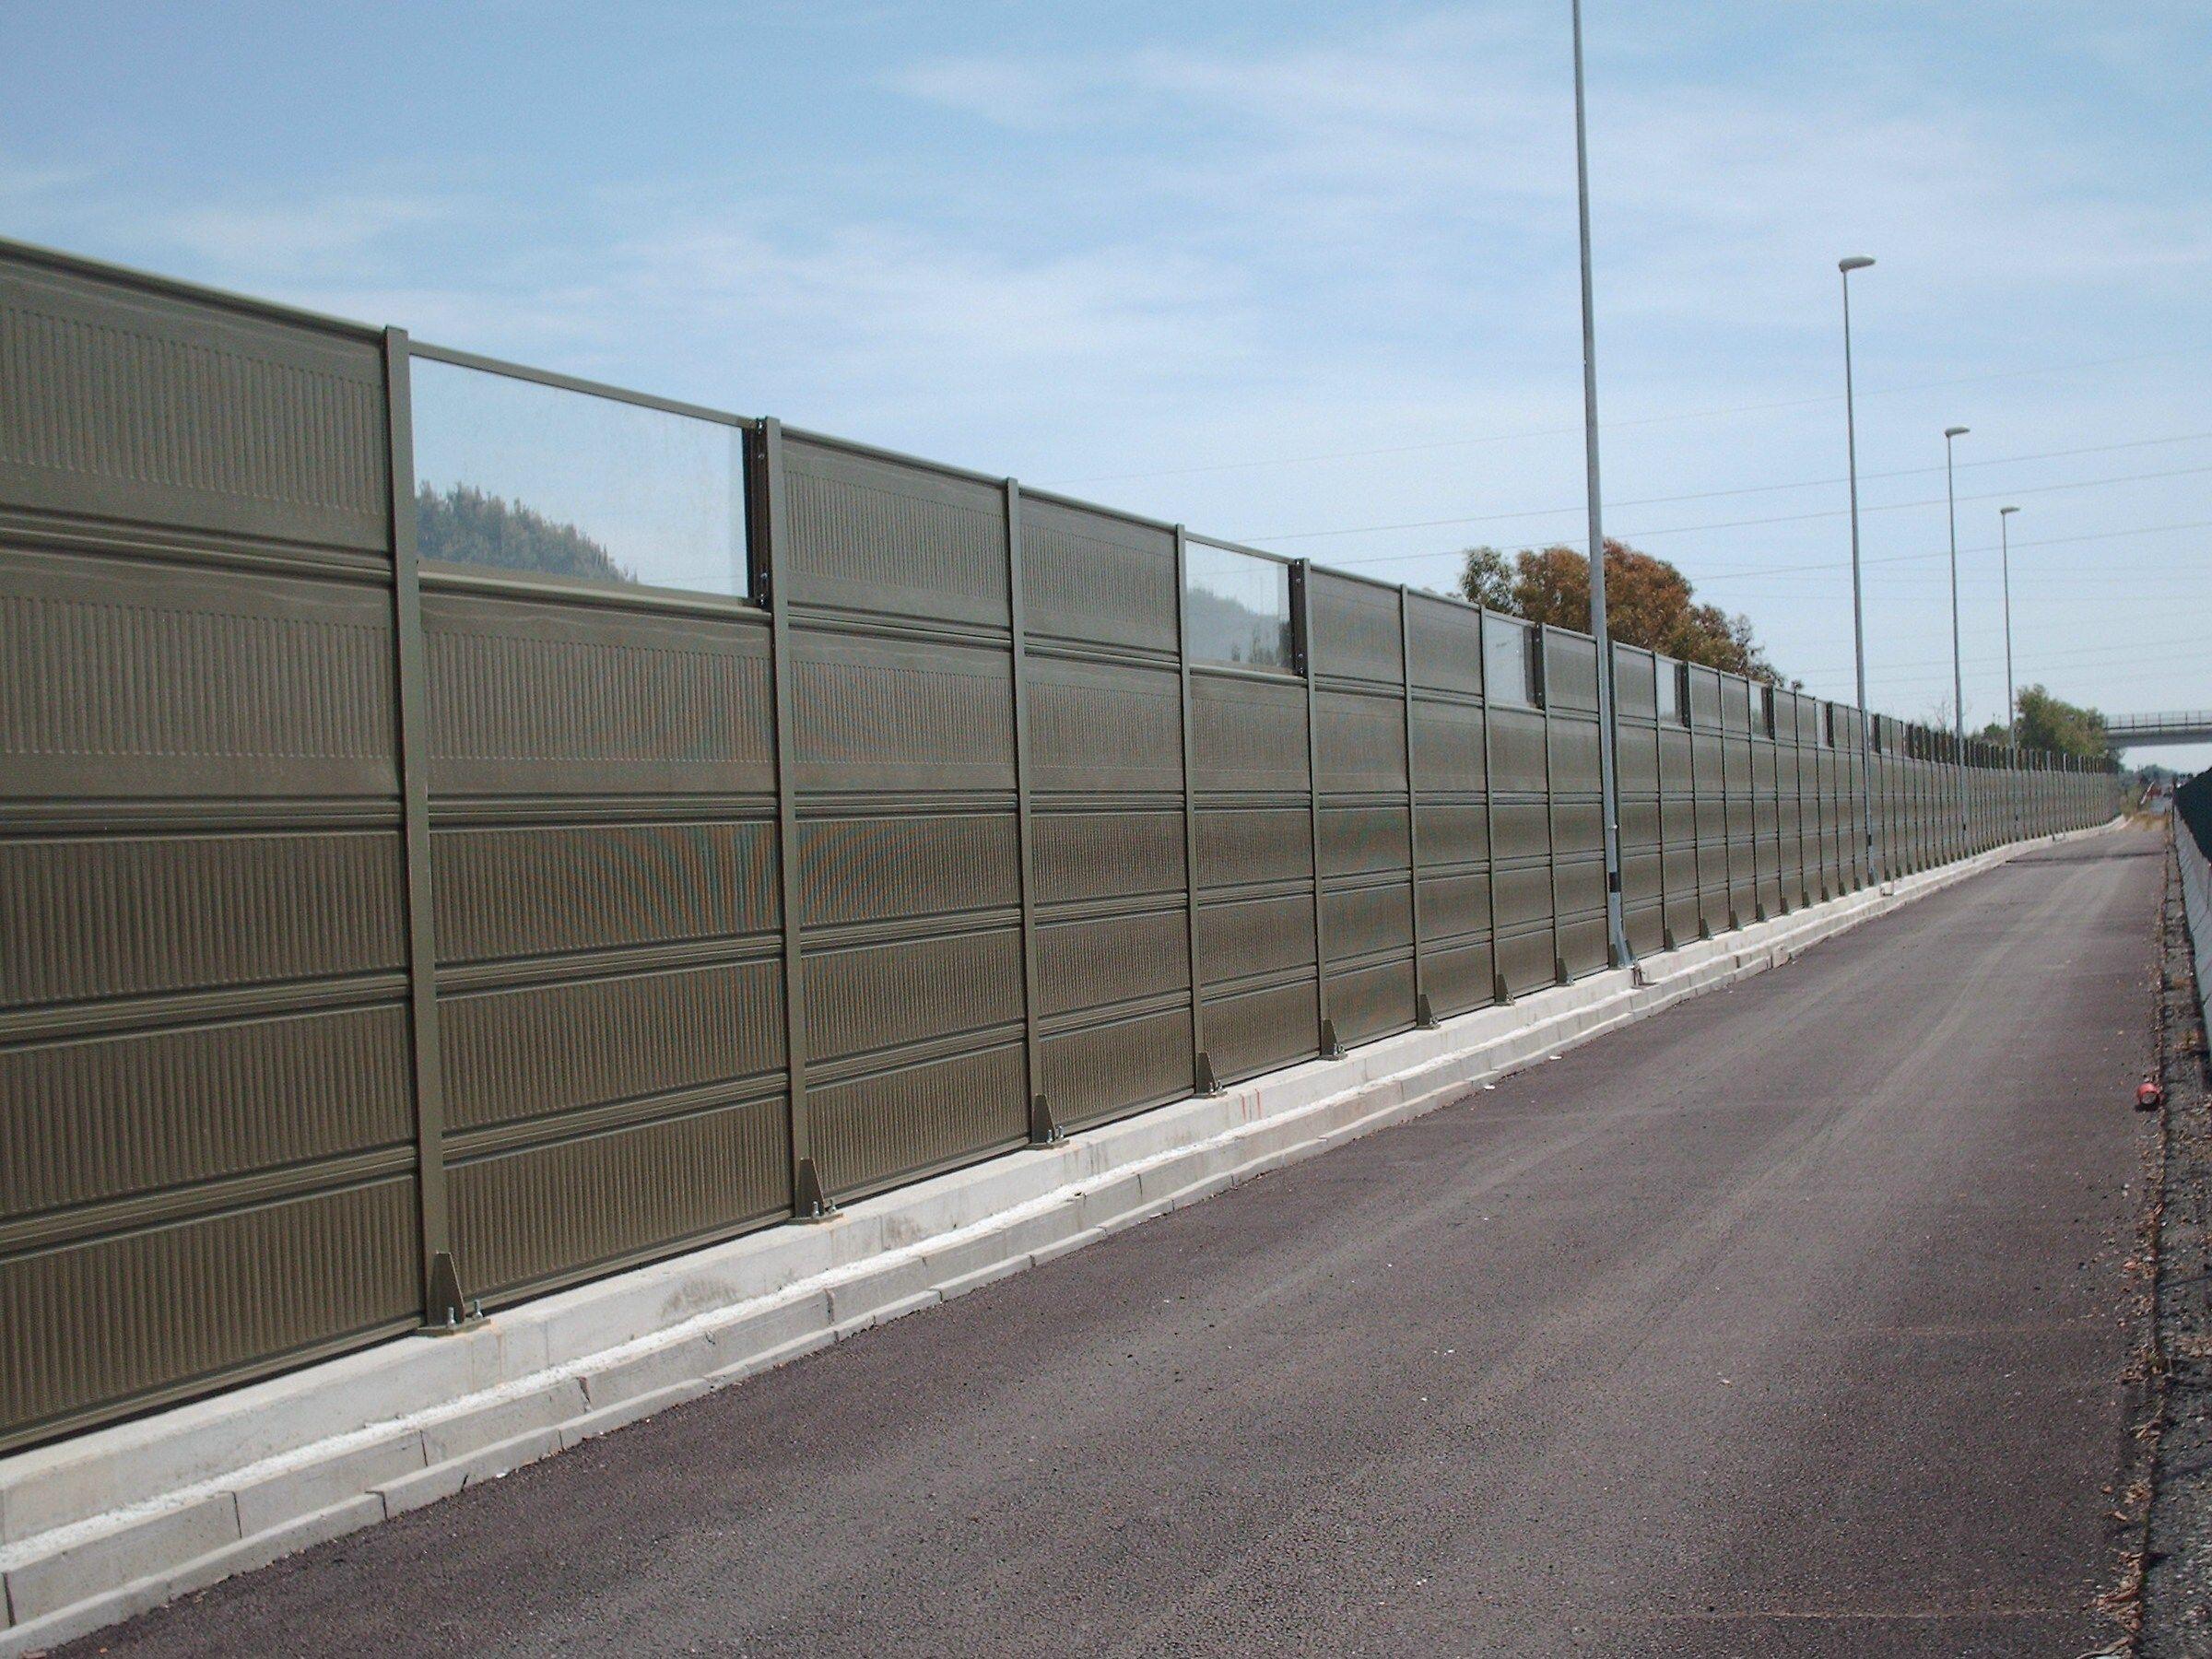 Road Noise Barrier Akuglass By Sitav Costruzioni Generali